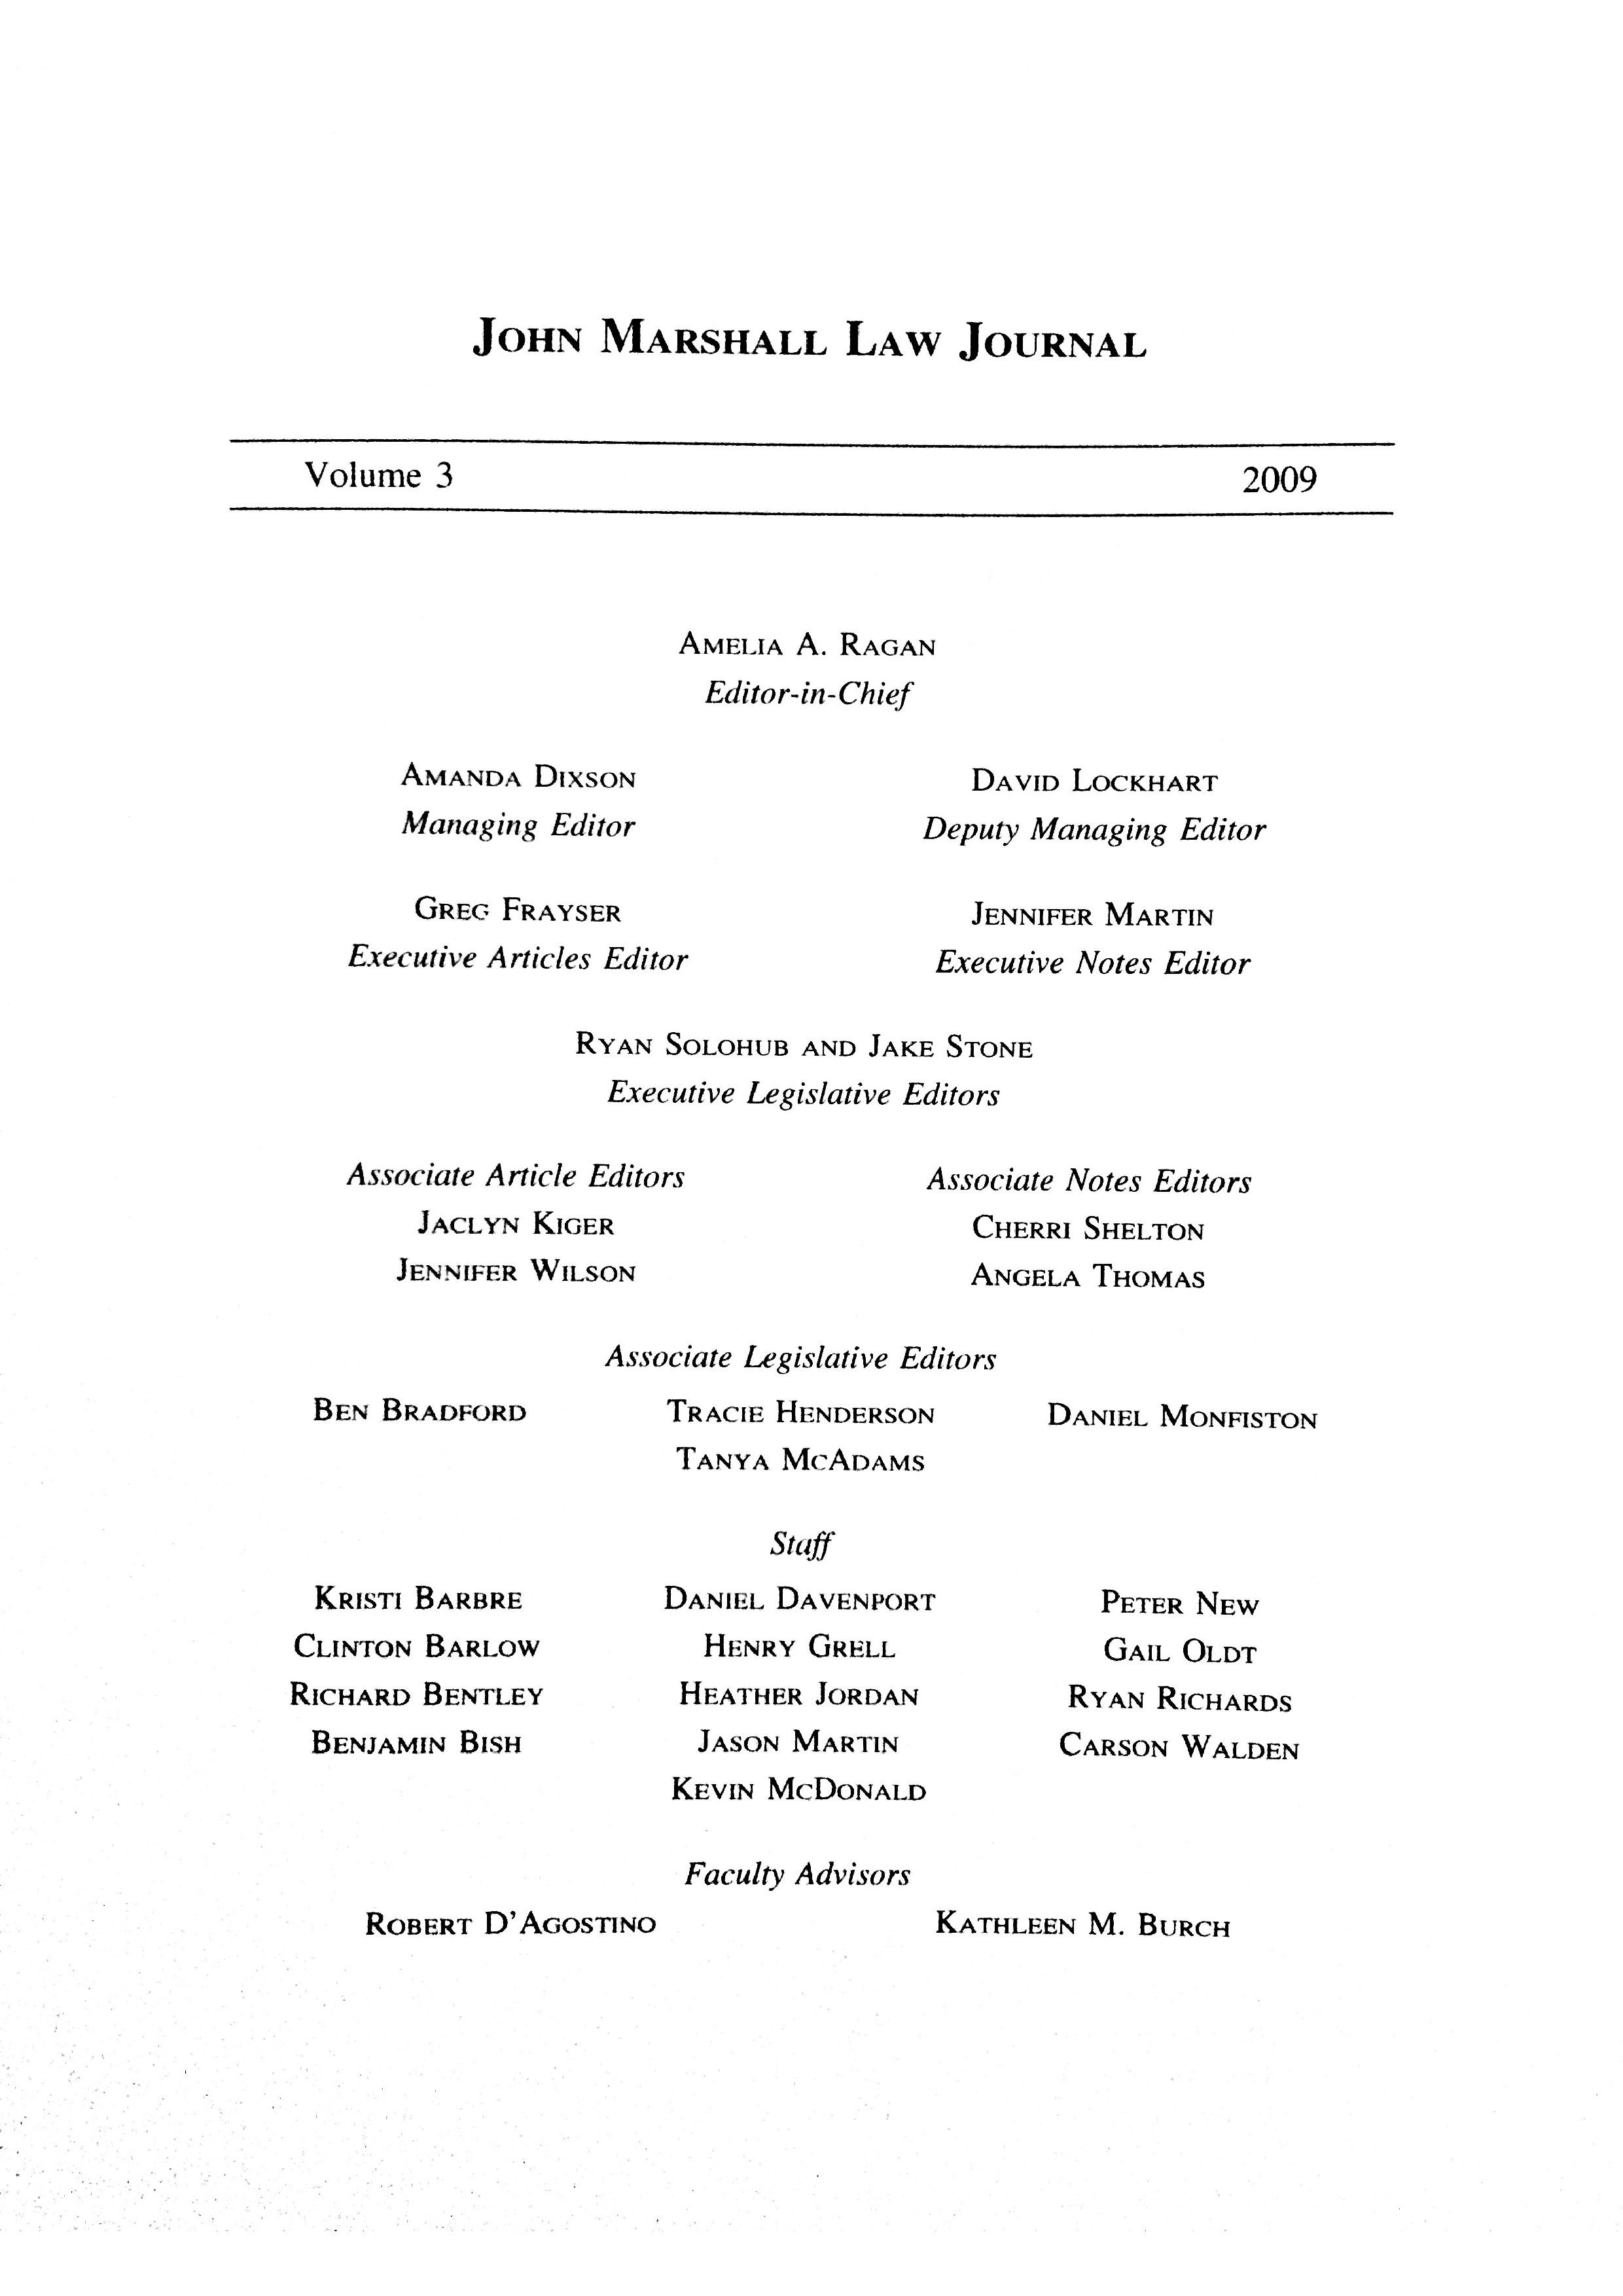 3-1_JMLJ_Masthead-page-0